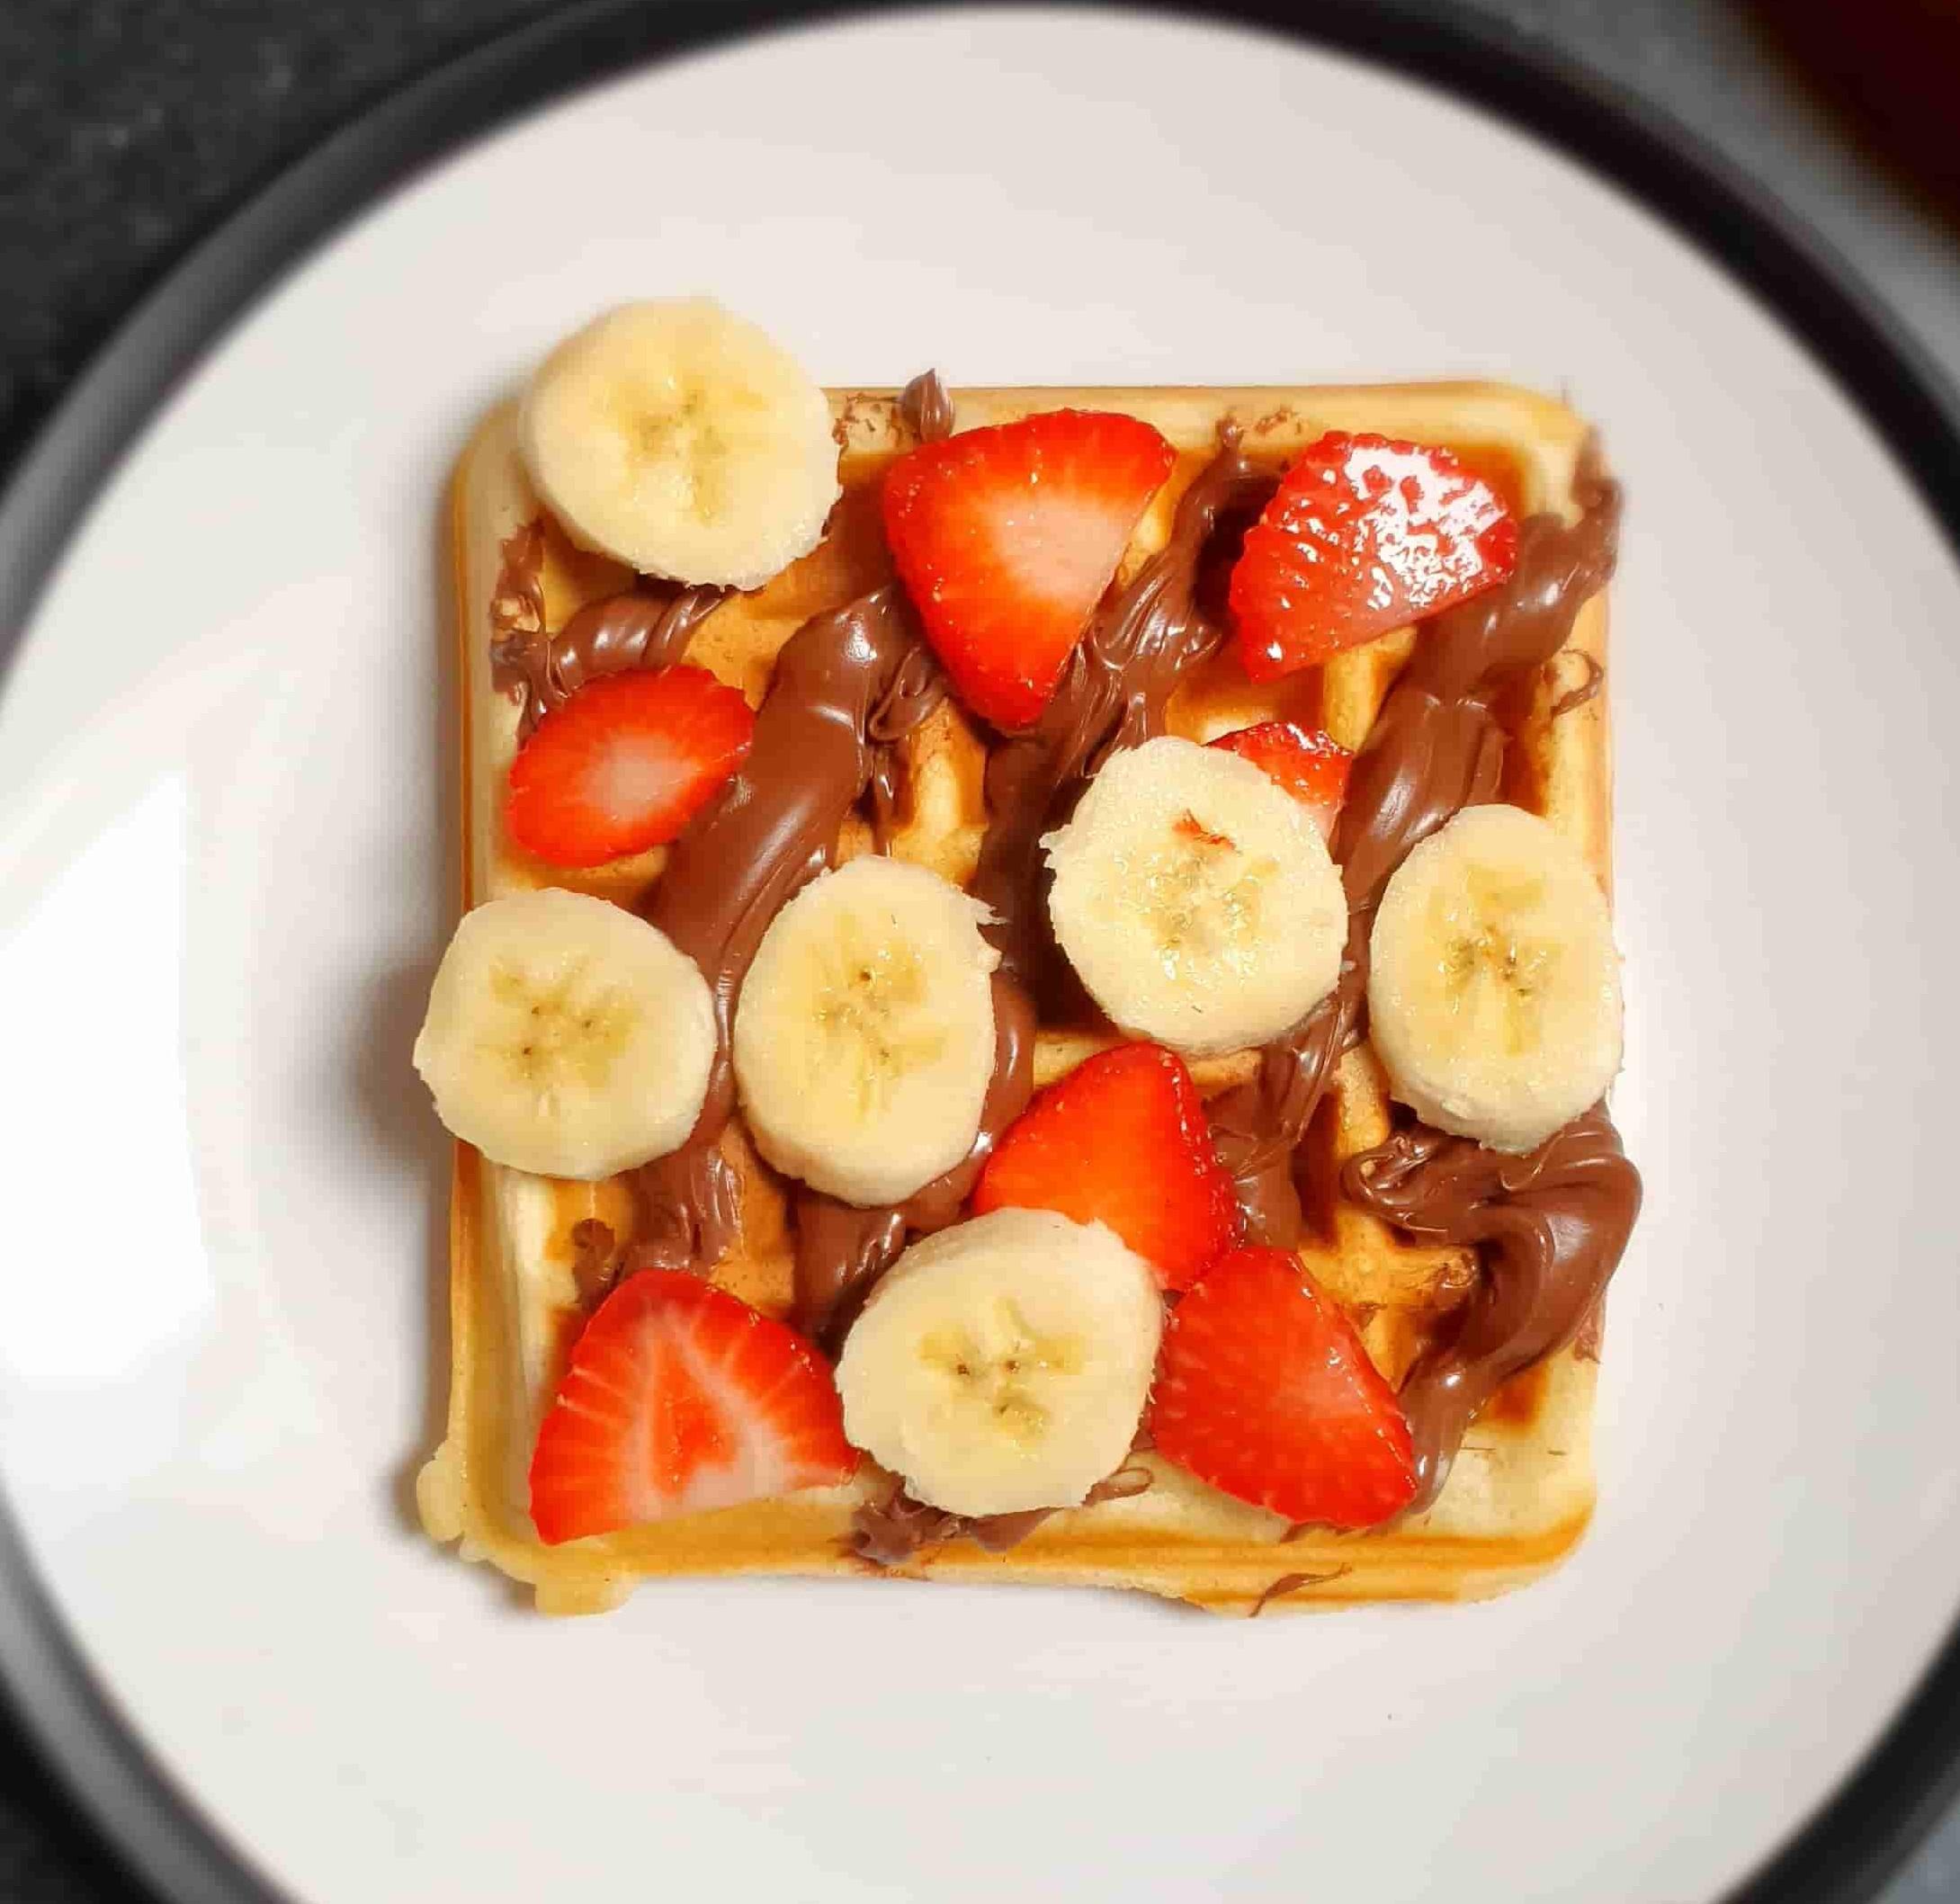 The Best Waffle Recipe for Light Crispy Waffles